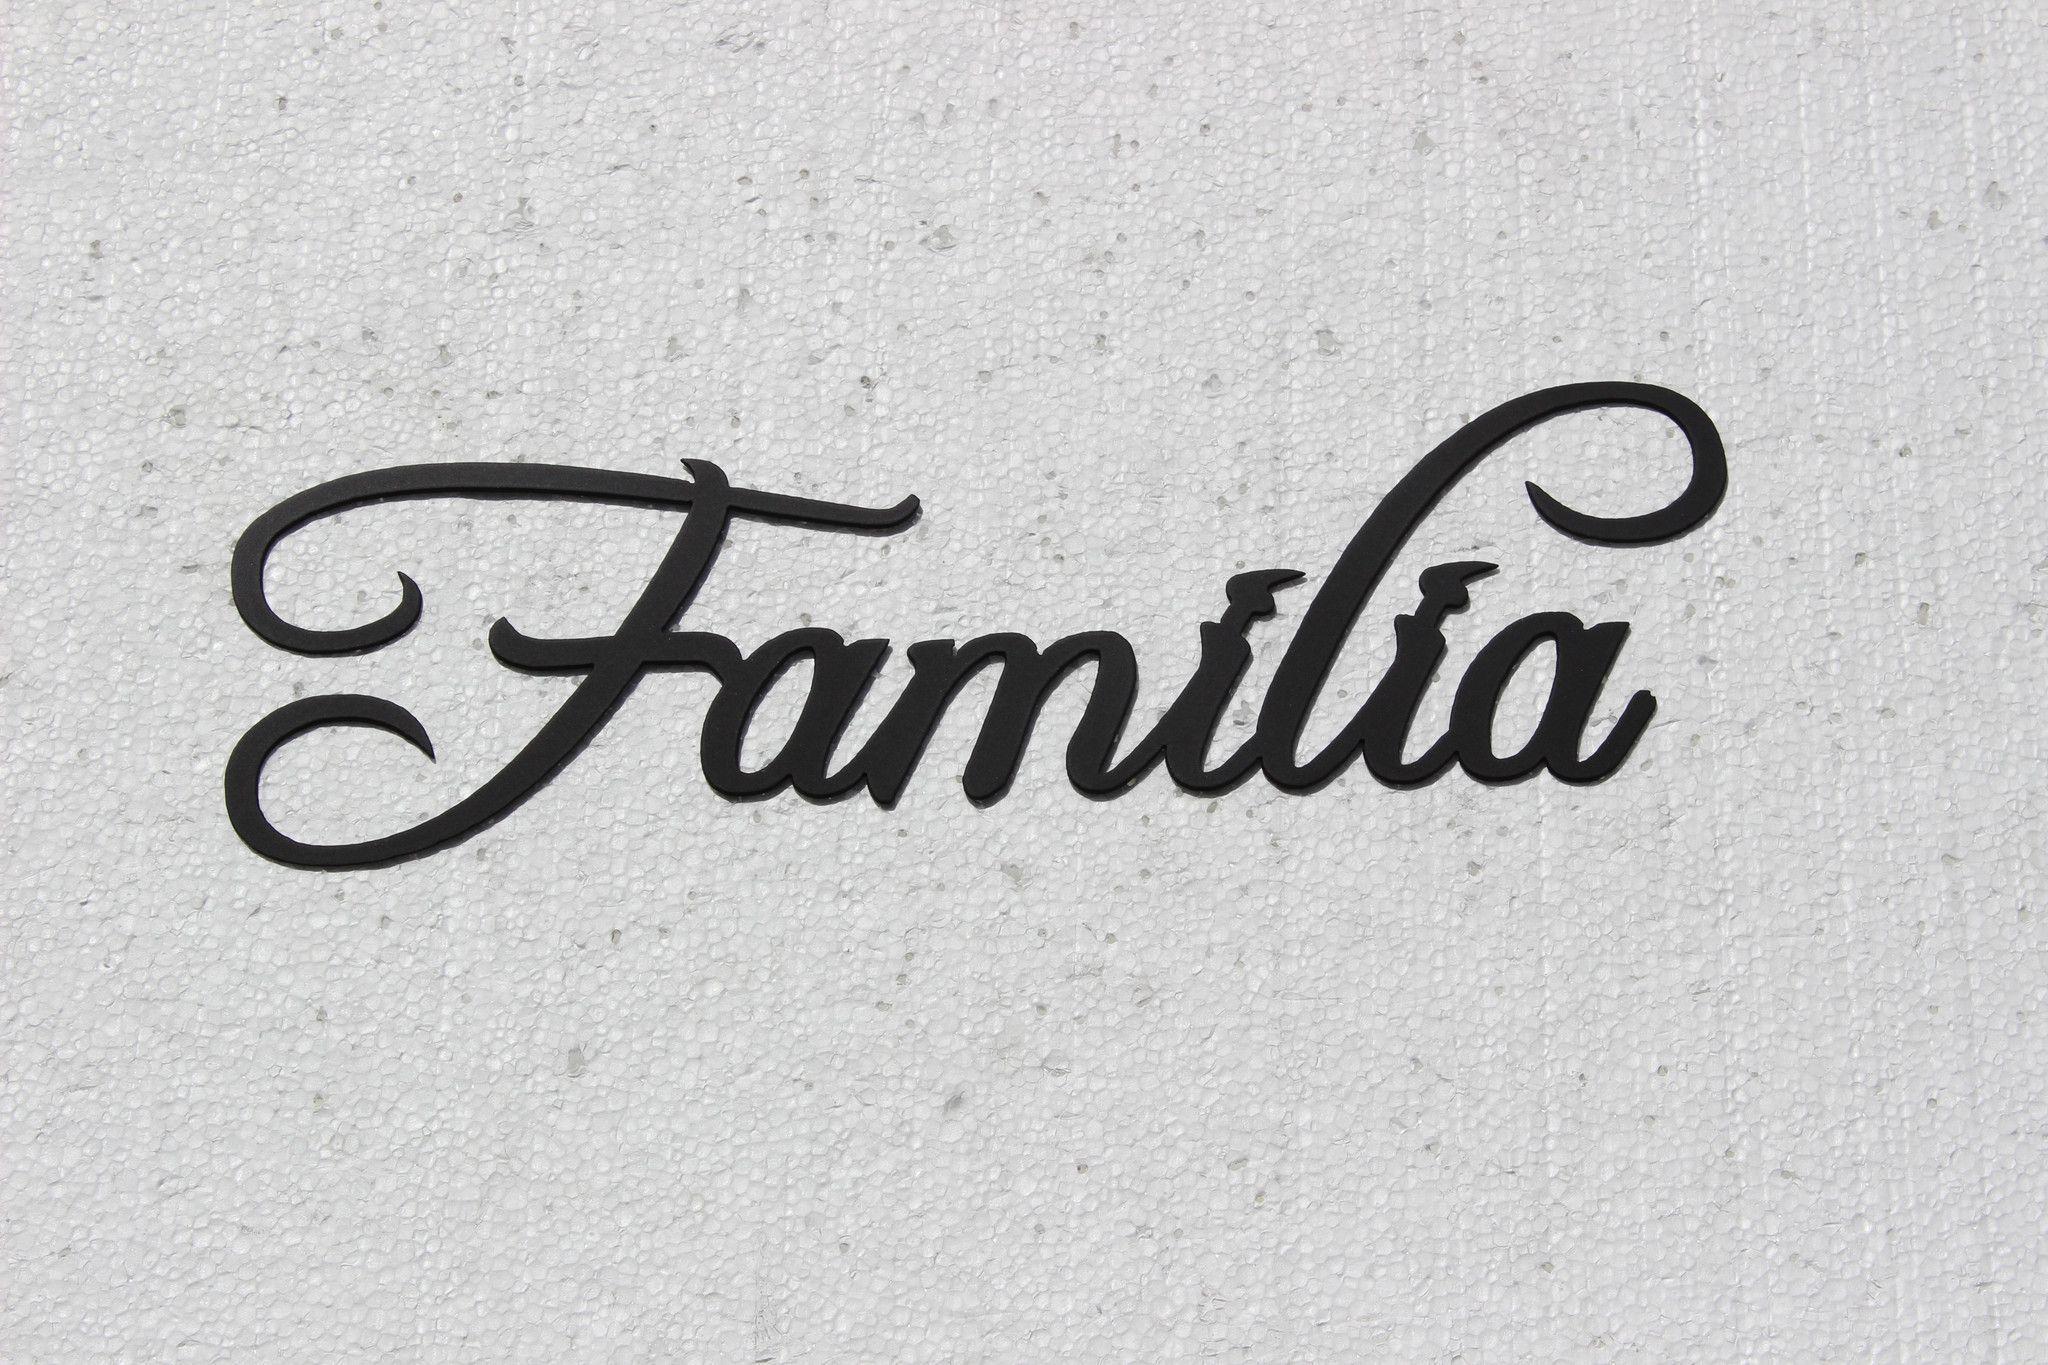 Familia Word Spanish Word For Family Black Metal Wall Art